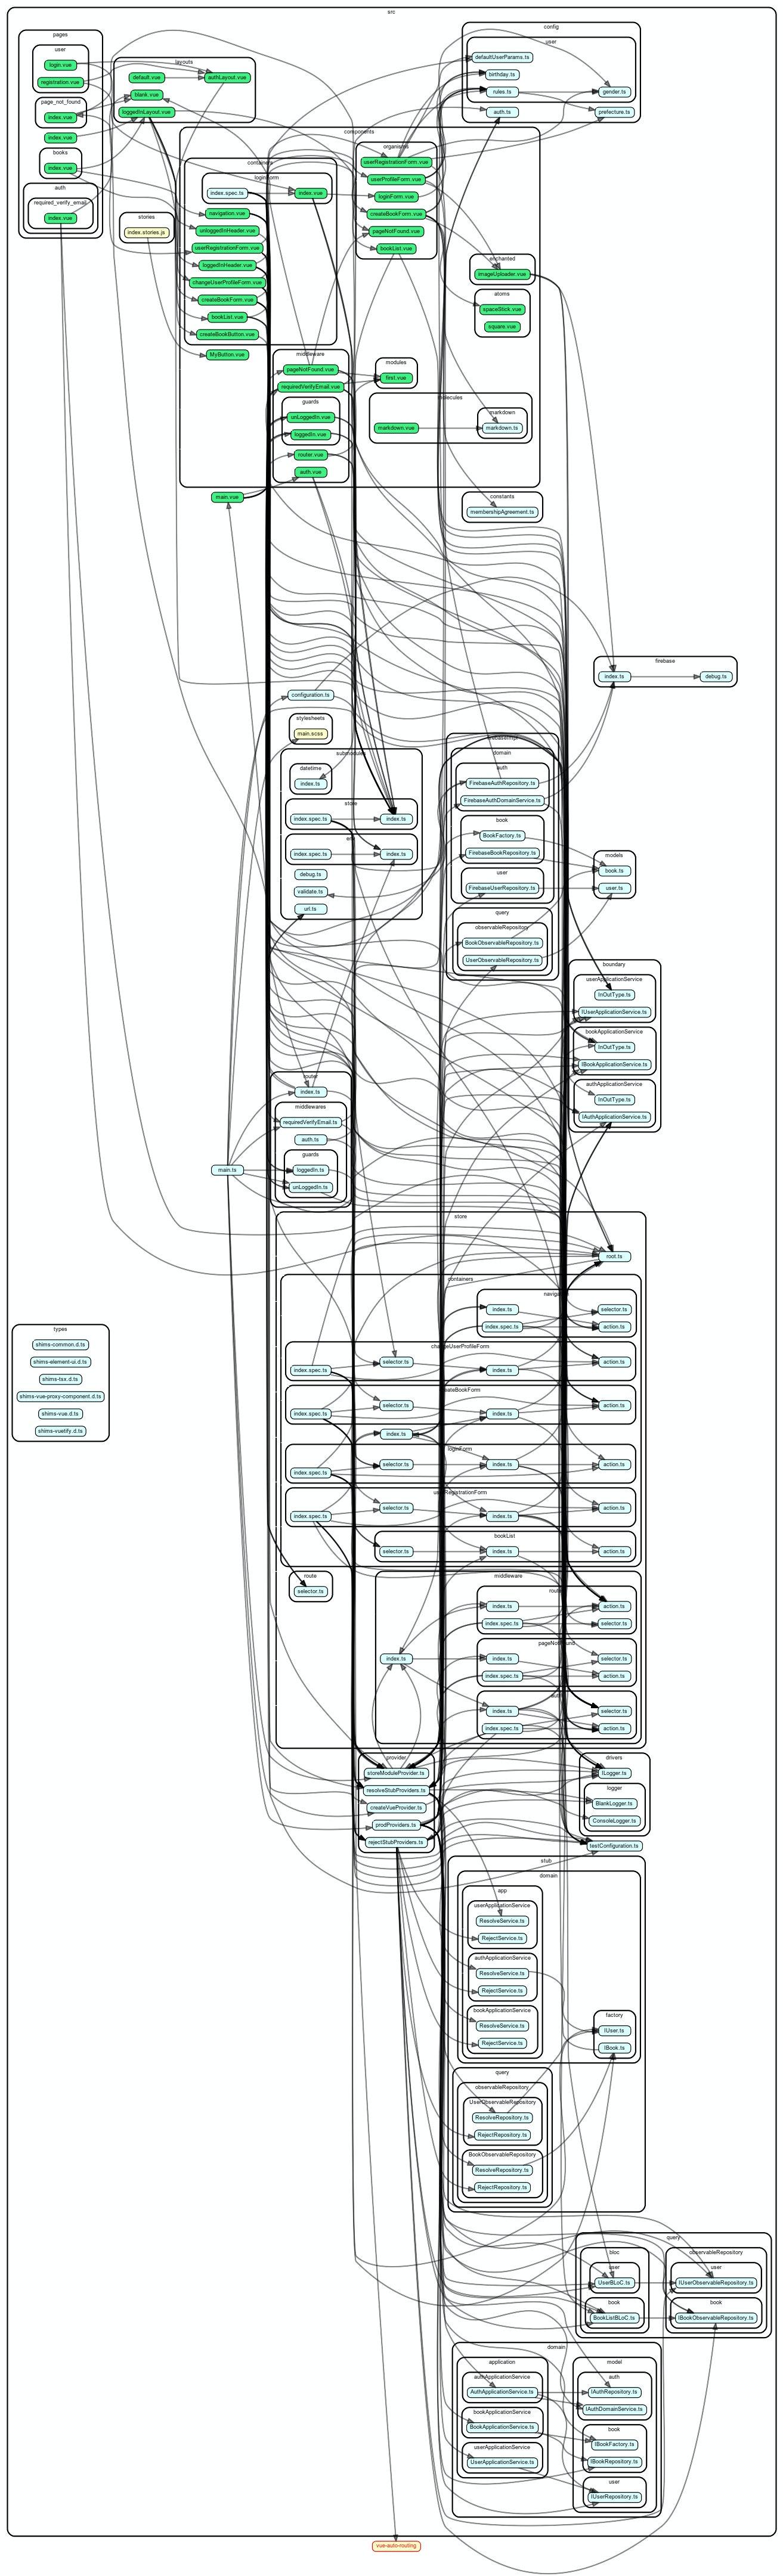 dependencygraph.jpg